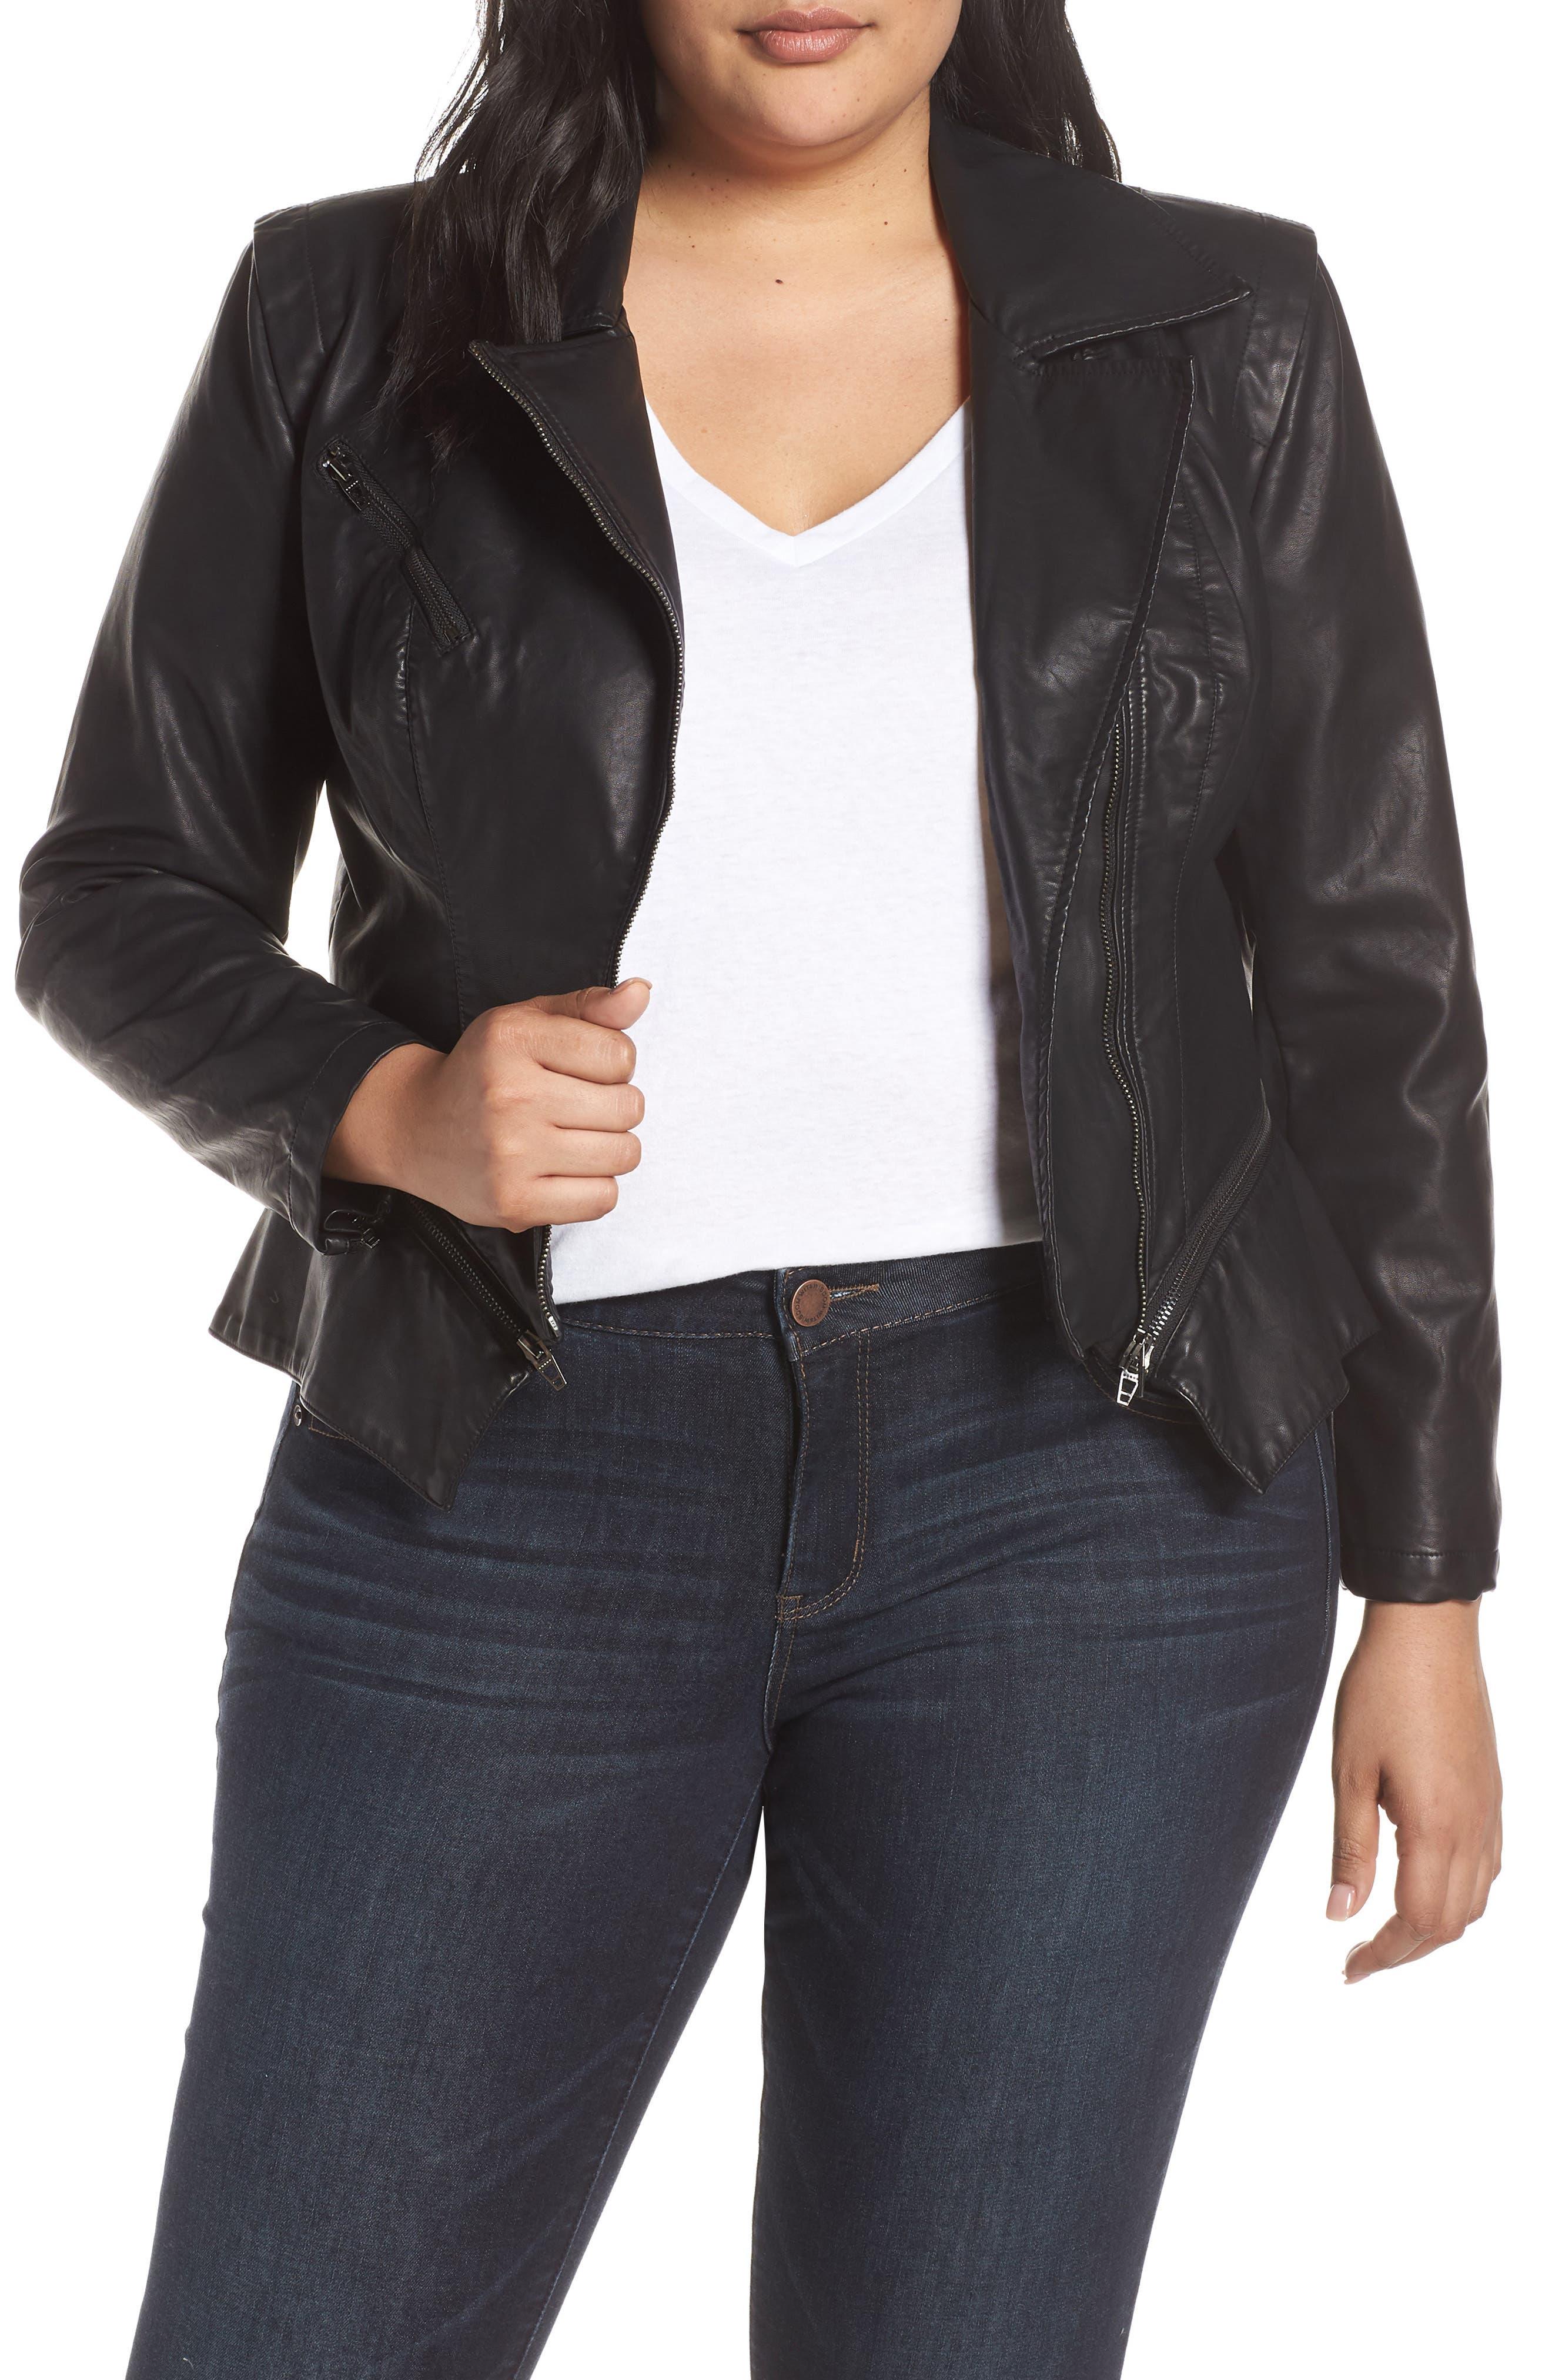 BLANKNYC, Faux Leather Moto Jacket, Alternate thumbnail 2, color, BLACK